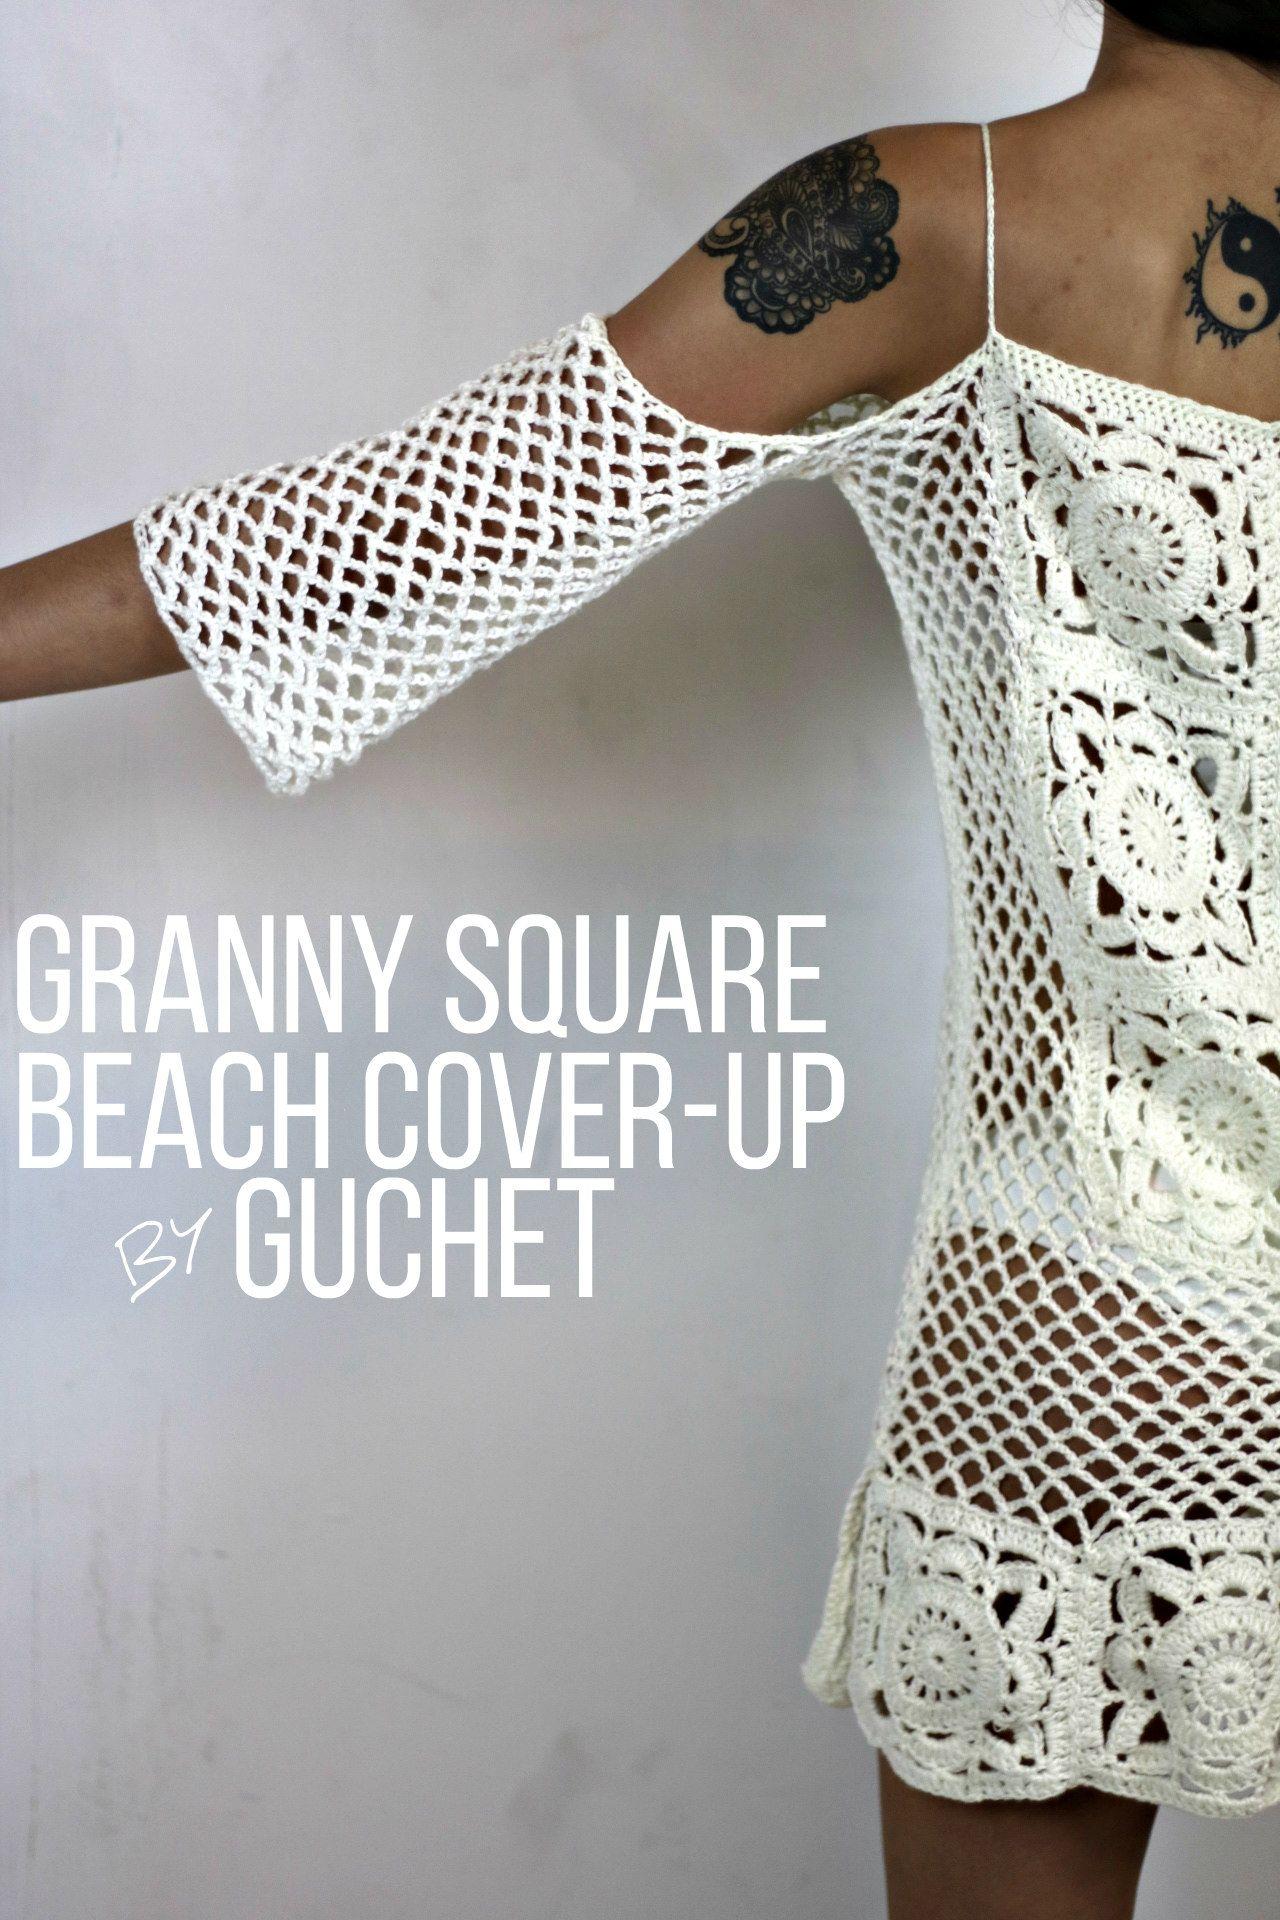 Crochet swimsuit cover pattern by guchet beach covers crochet crochet beach cover up crochet pattern bankloansurffo Images